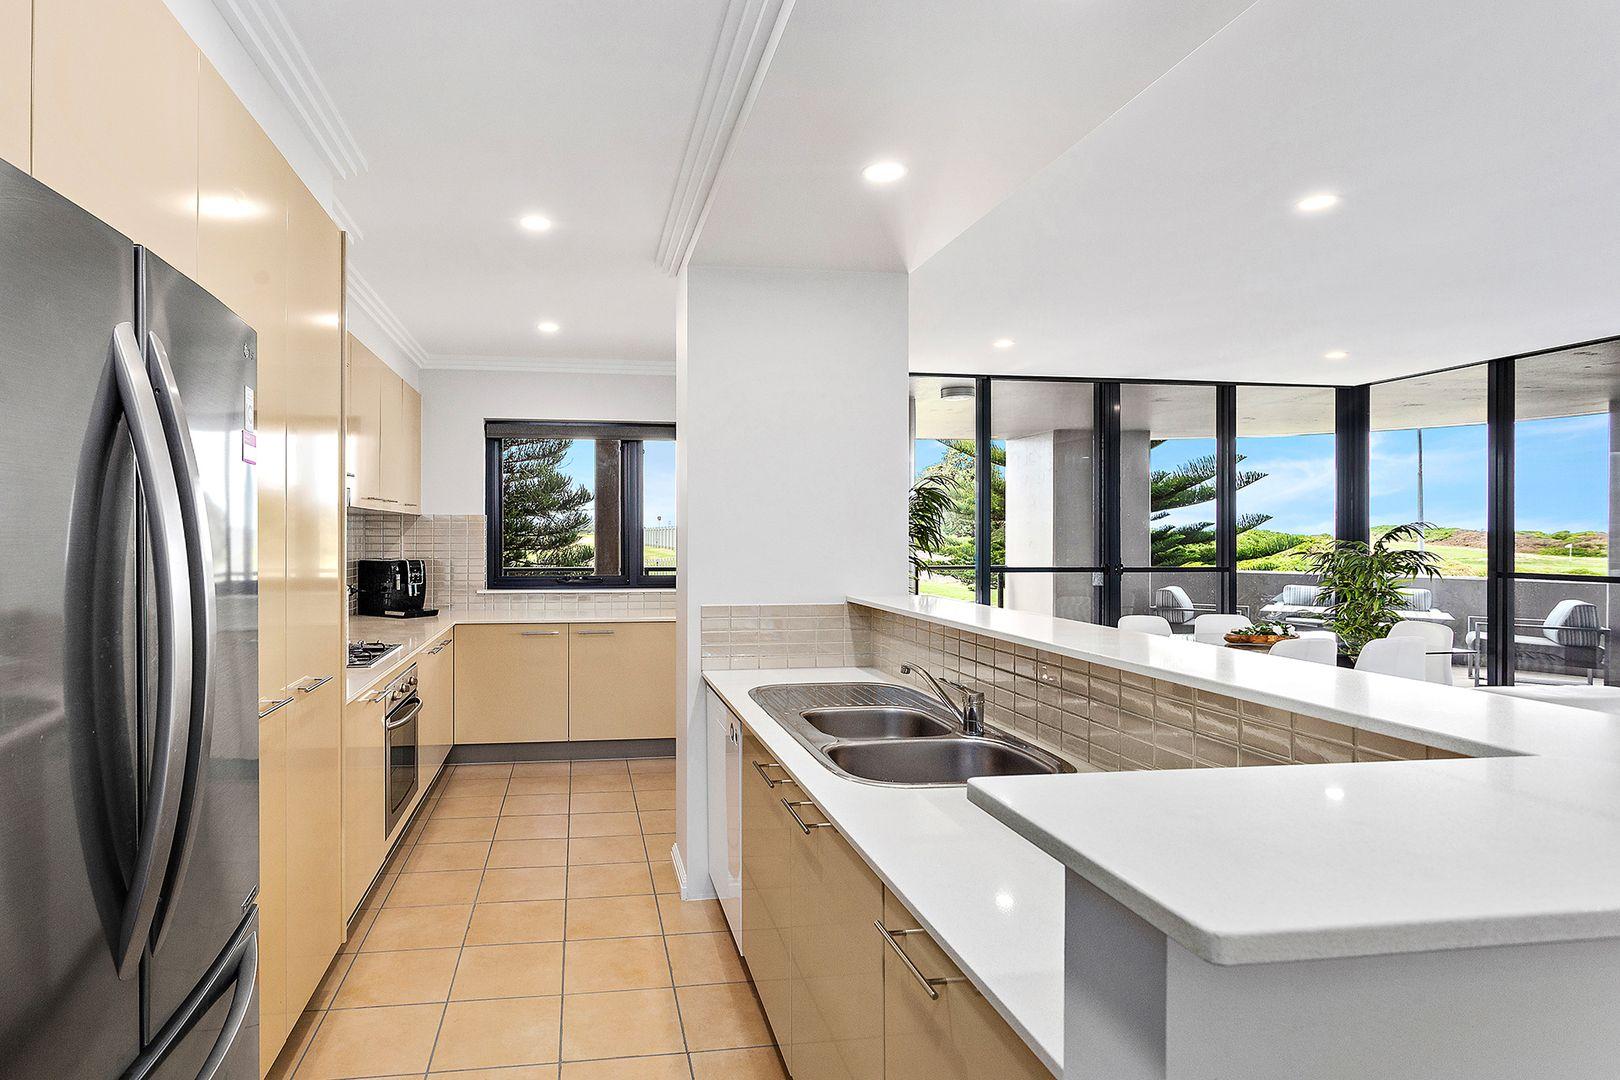 19/4 Bank Street, Wollongong NSW 2500, Image 1